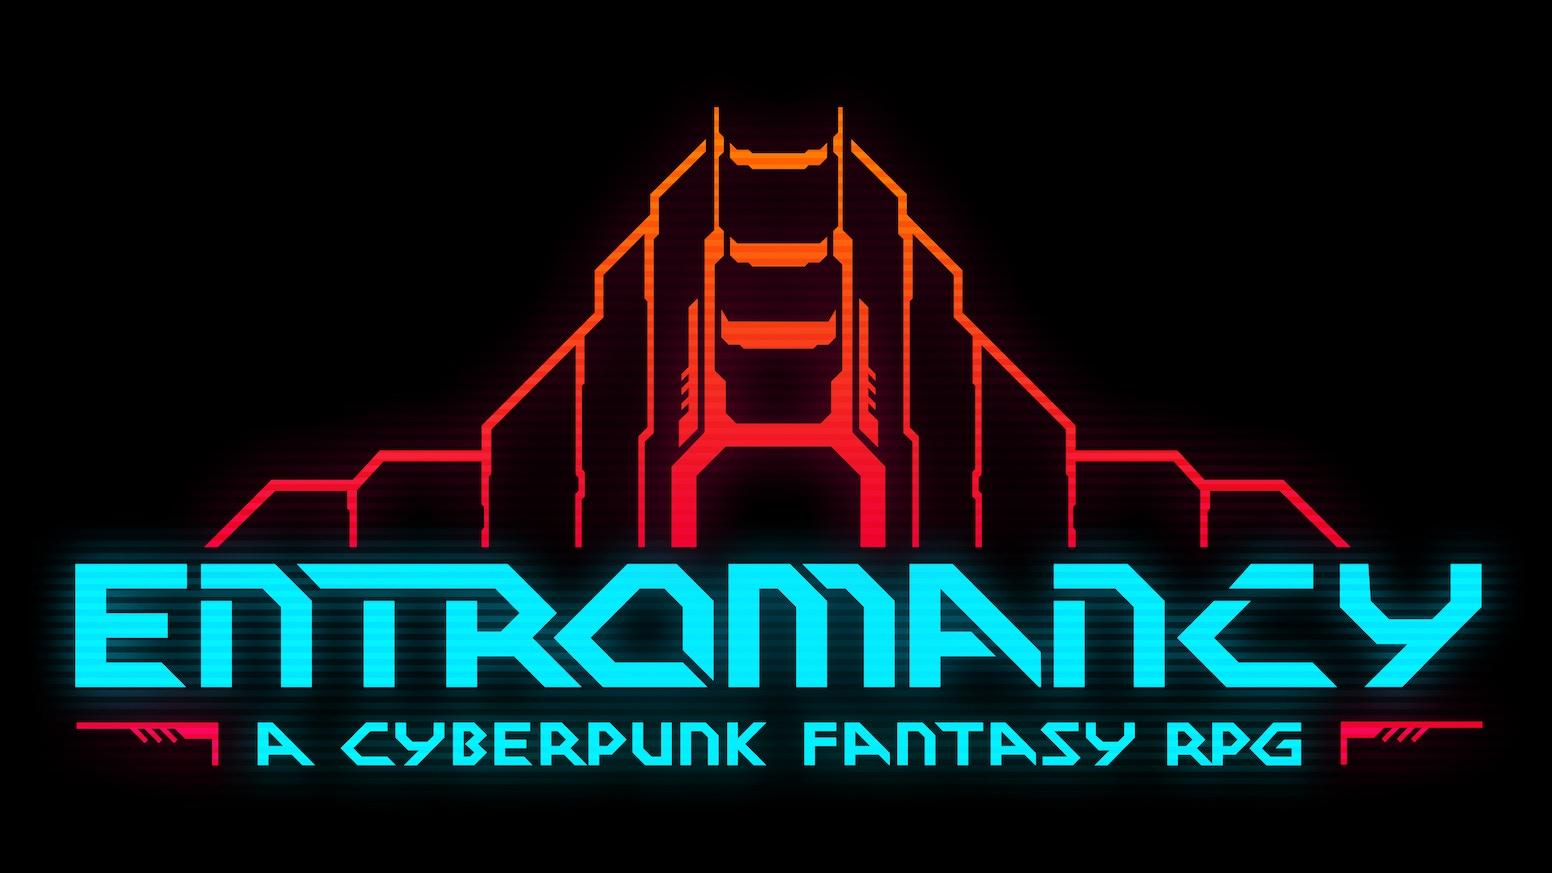 Entromancy: A Cyberpunk Fantasy Roleplaying Game by M  S  Farzan